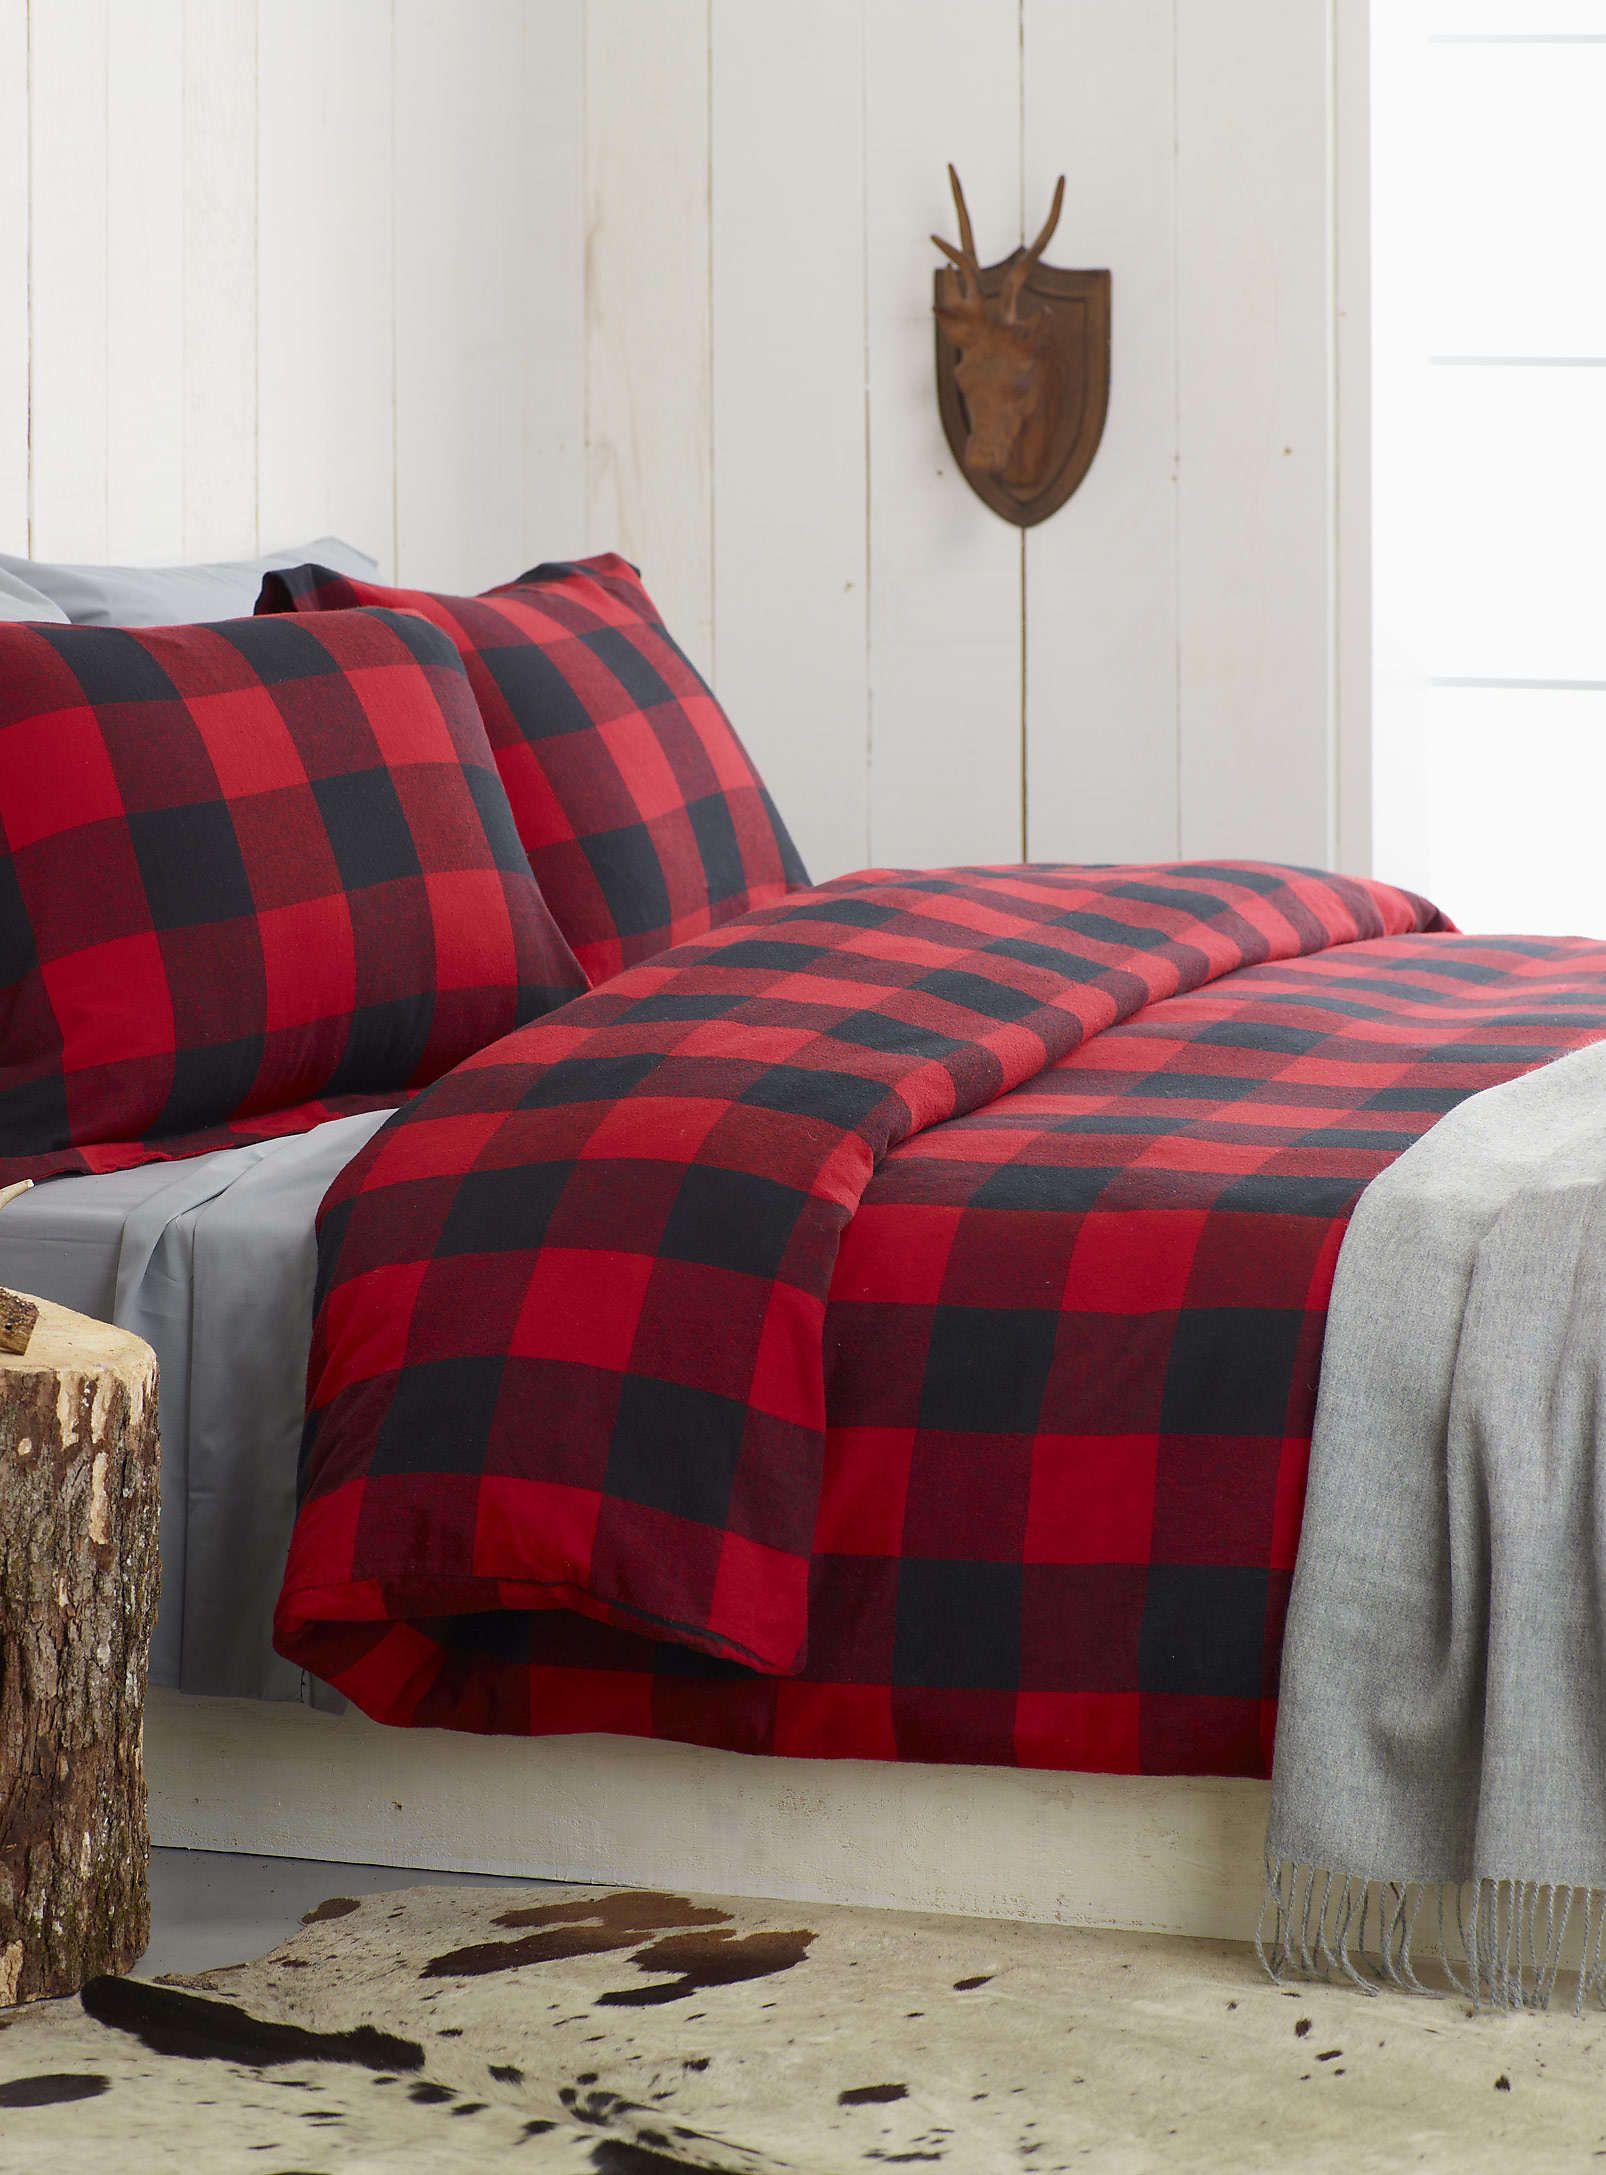 Red flannel sheets  Luensemble housse finette carreaux Buffalo  Simons  Love Tartan